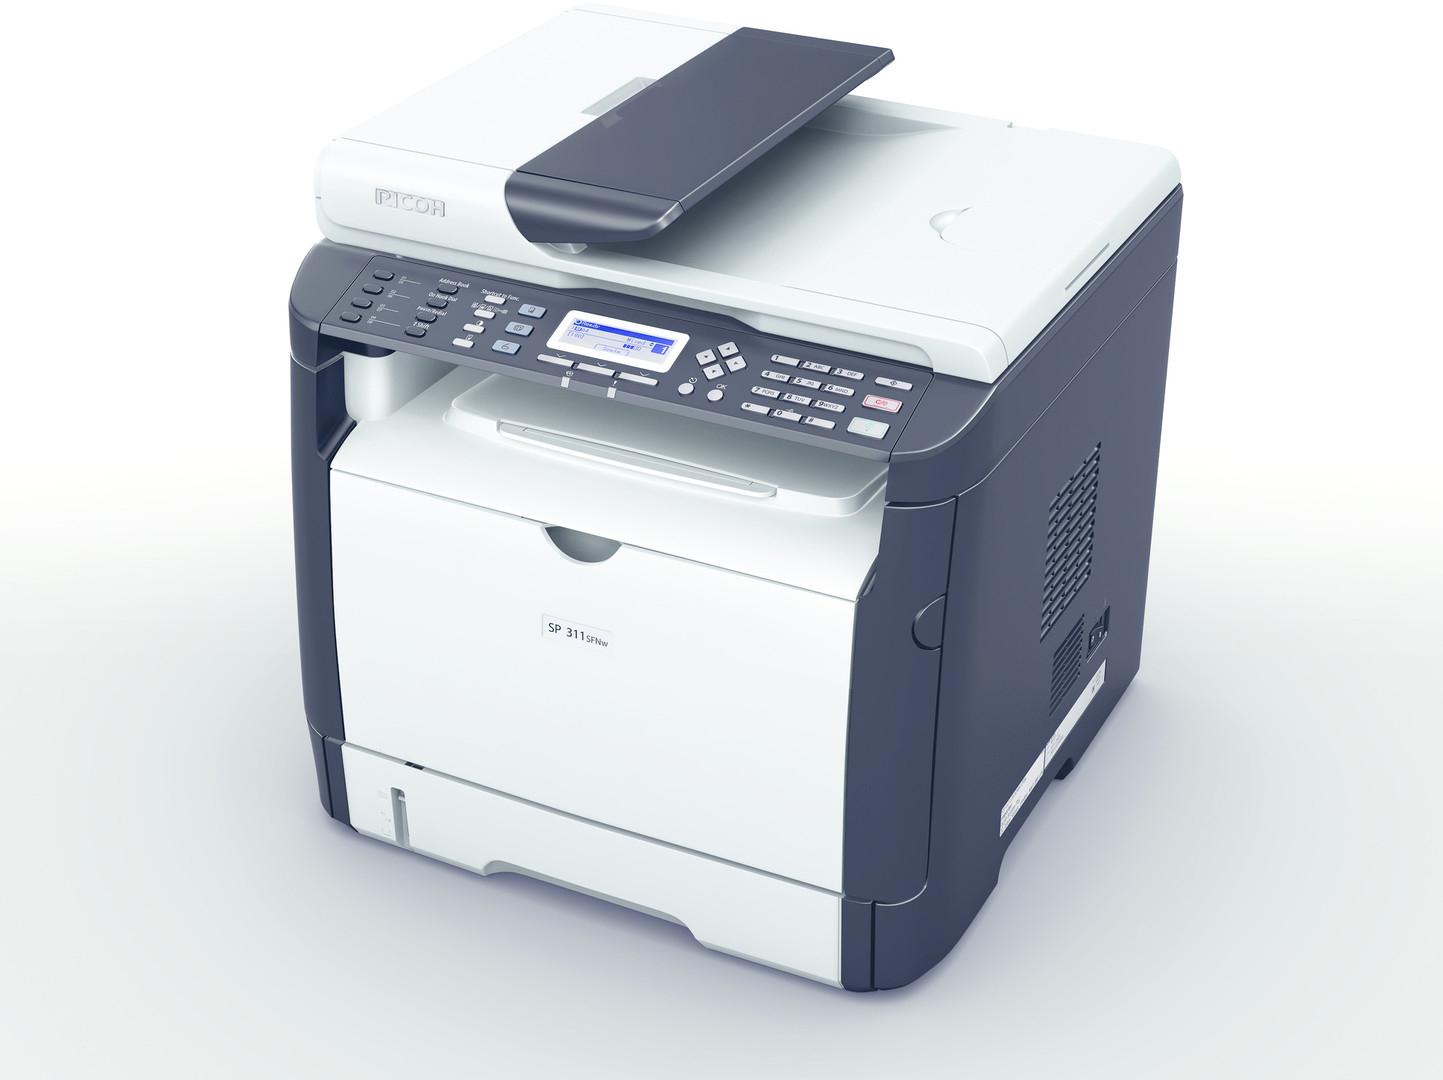 PRIJSFOUT: Ricoh SP 311SFN All-in-one laserprinter voor € 15,51 @ Azerty